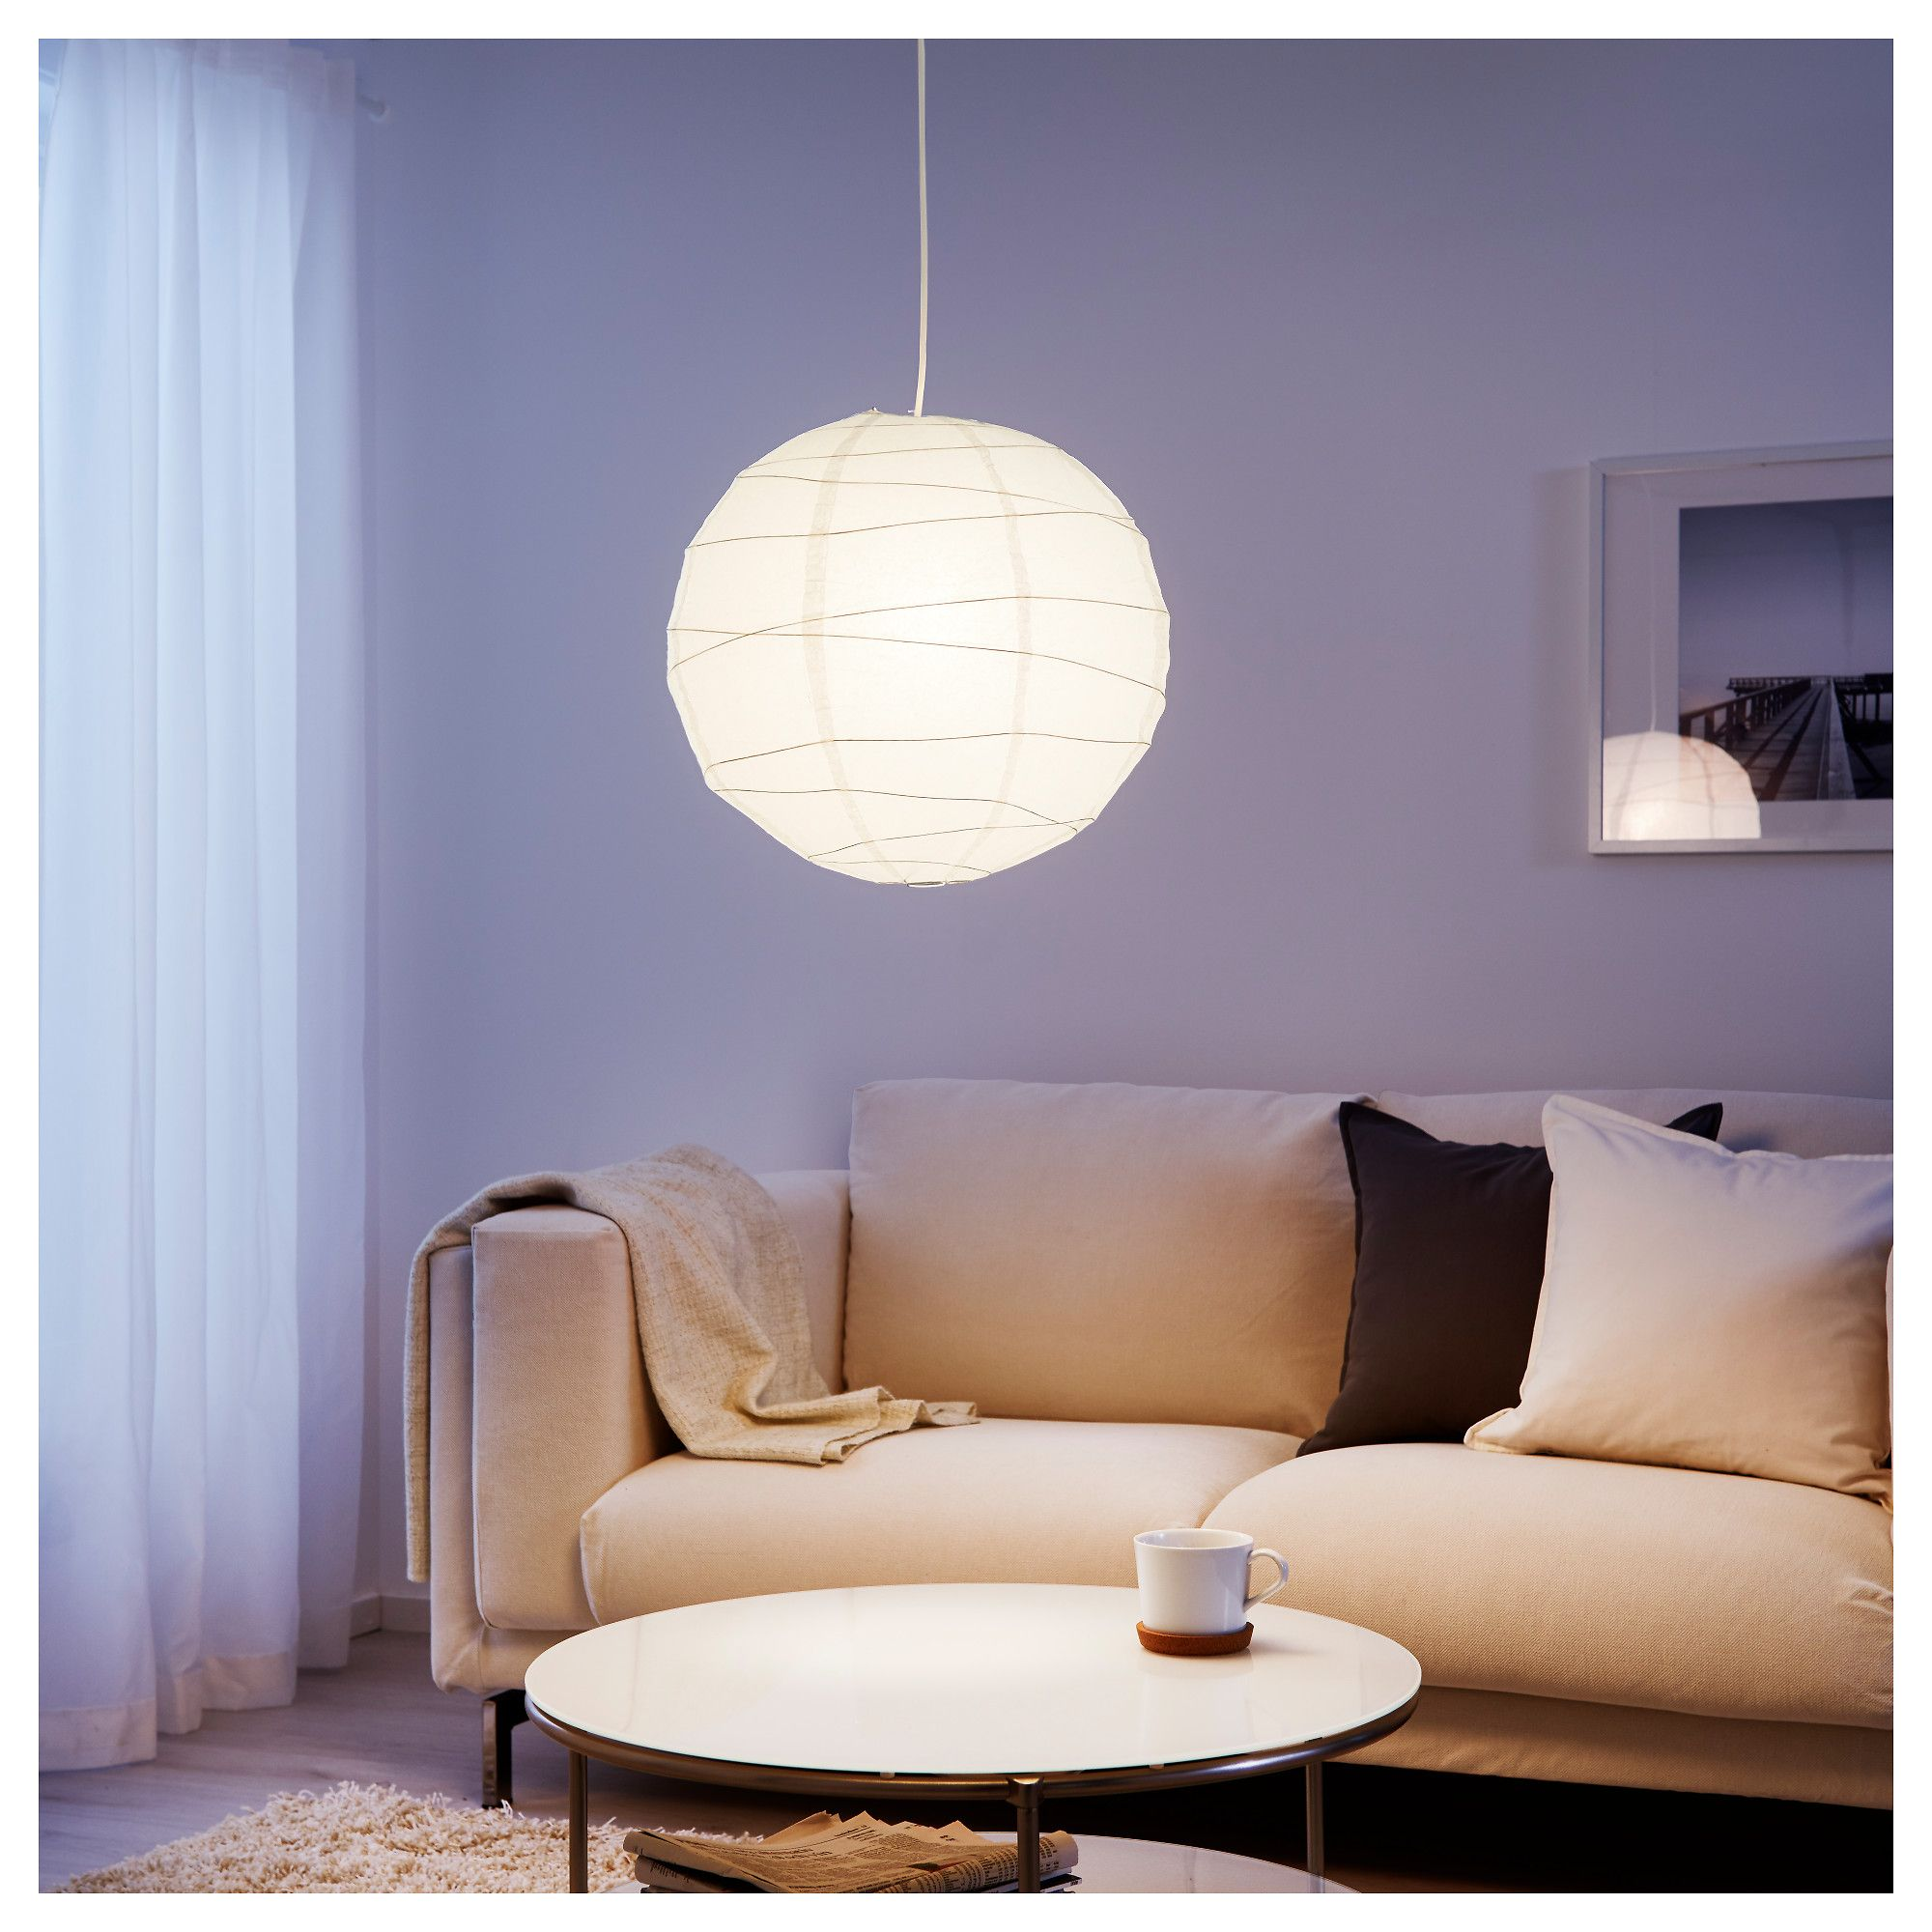 Regolit pendant lamp shade white 45 cm pendant lamps lighting ikea regolit pendant lamp shade each handmade shade is unique mozeypictures Images